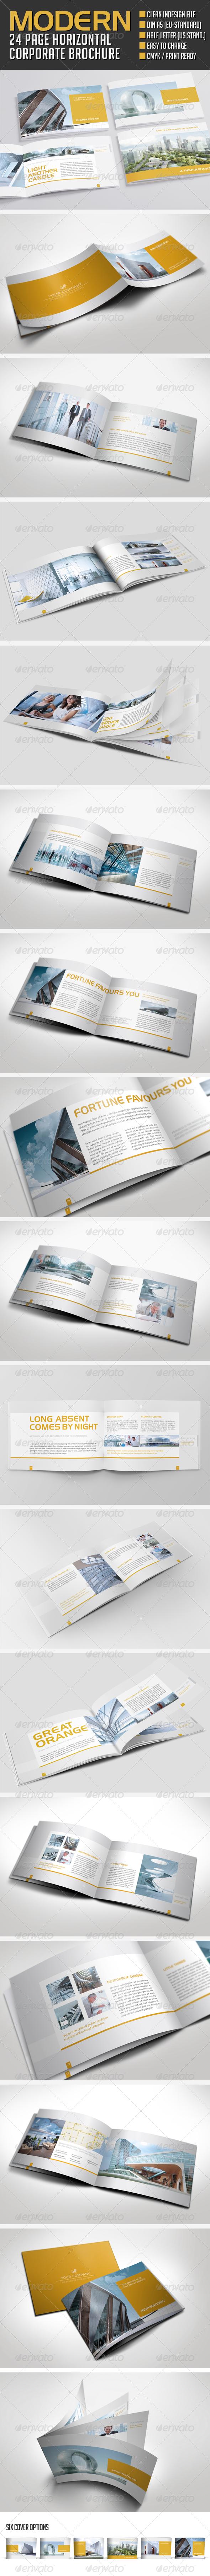 Modern Image Brochure - Corporate Brochures